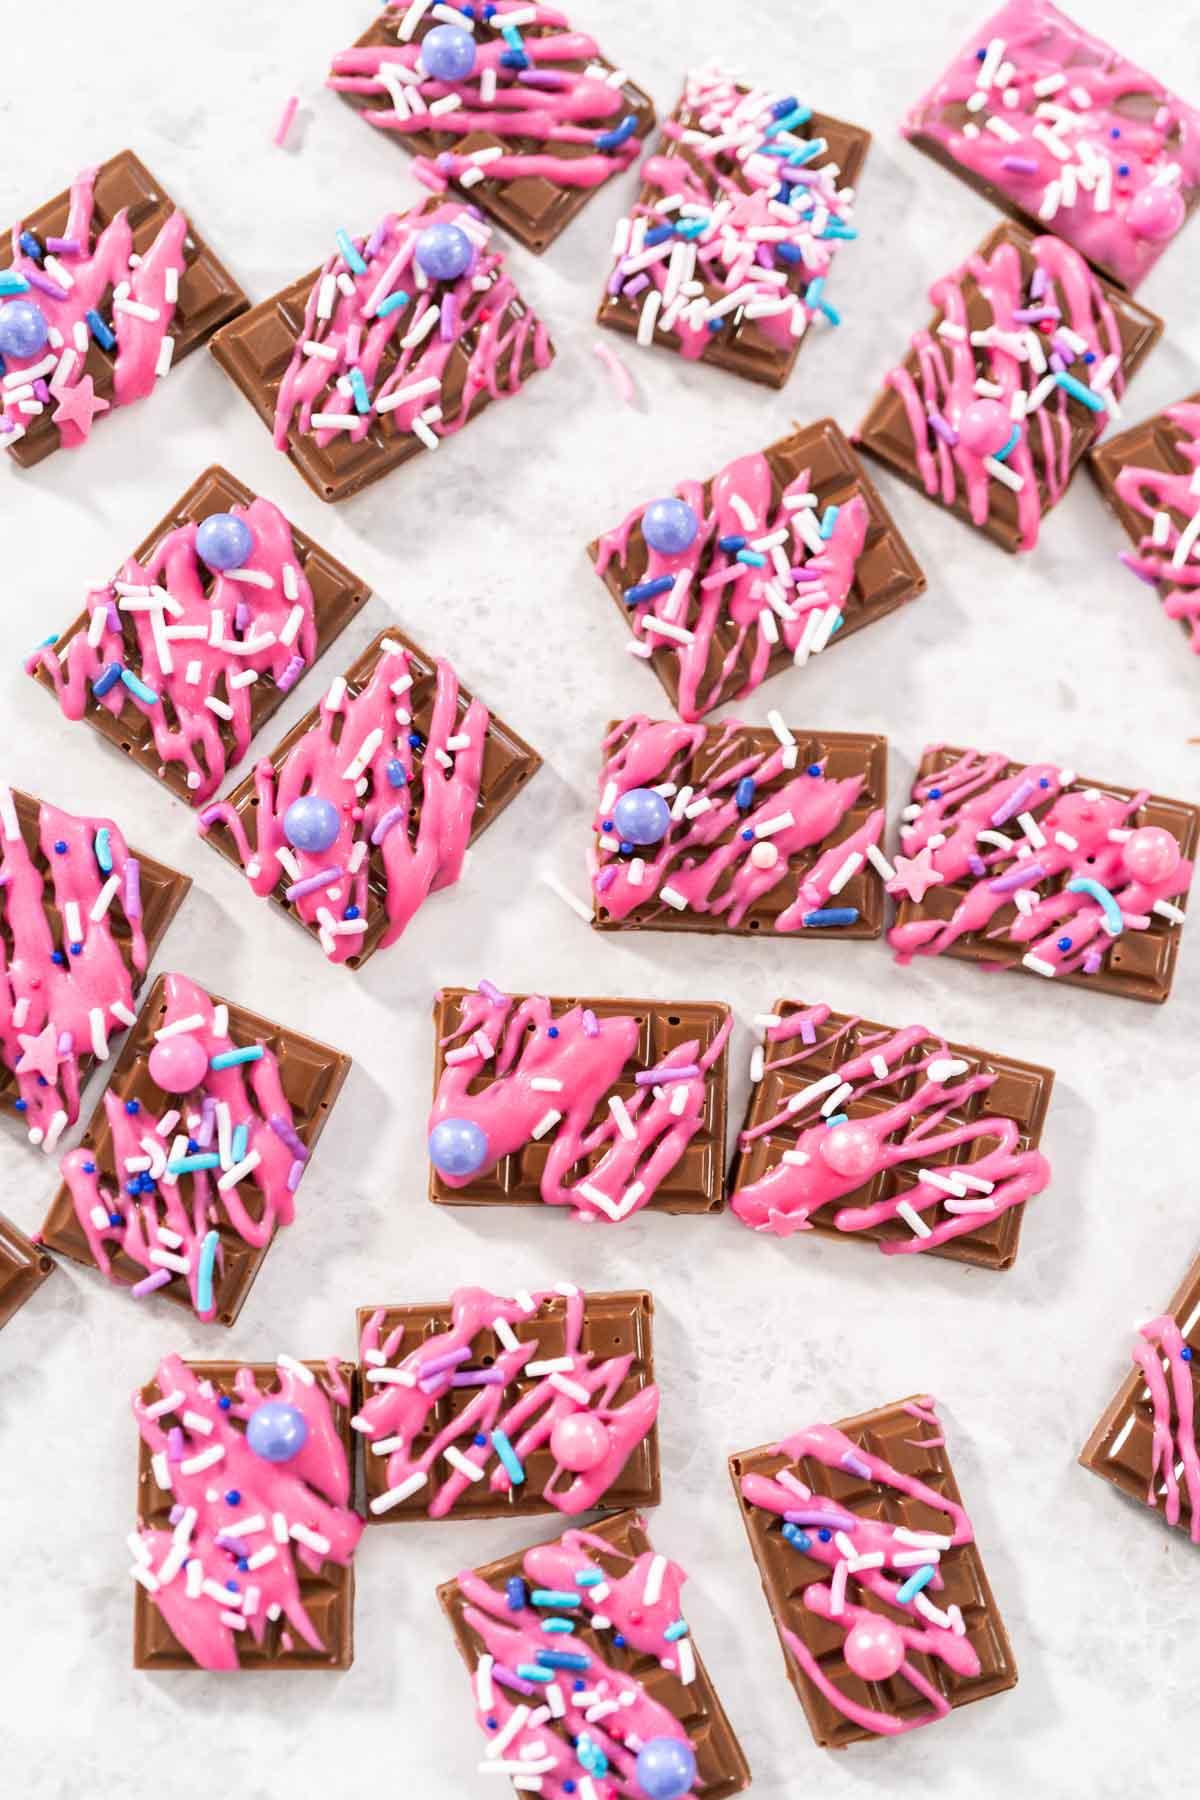 Mini chocolates with sprinkles